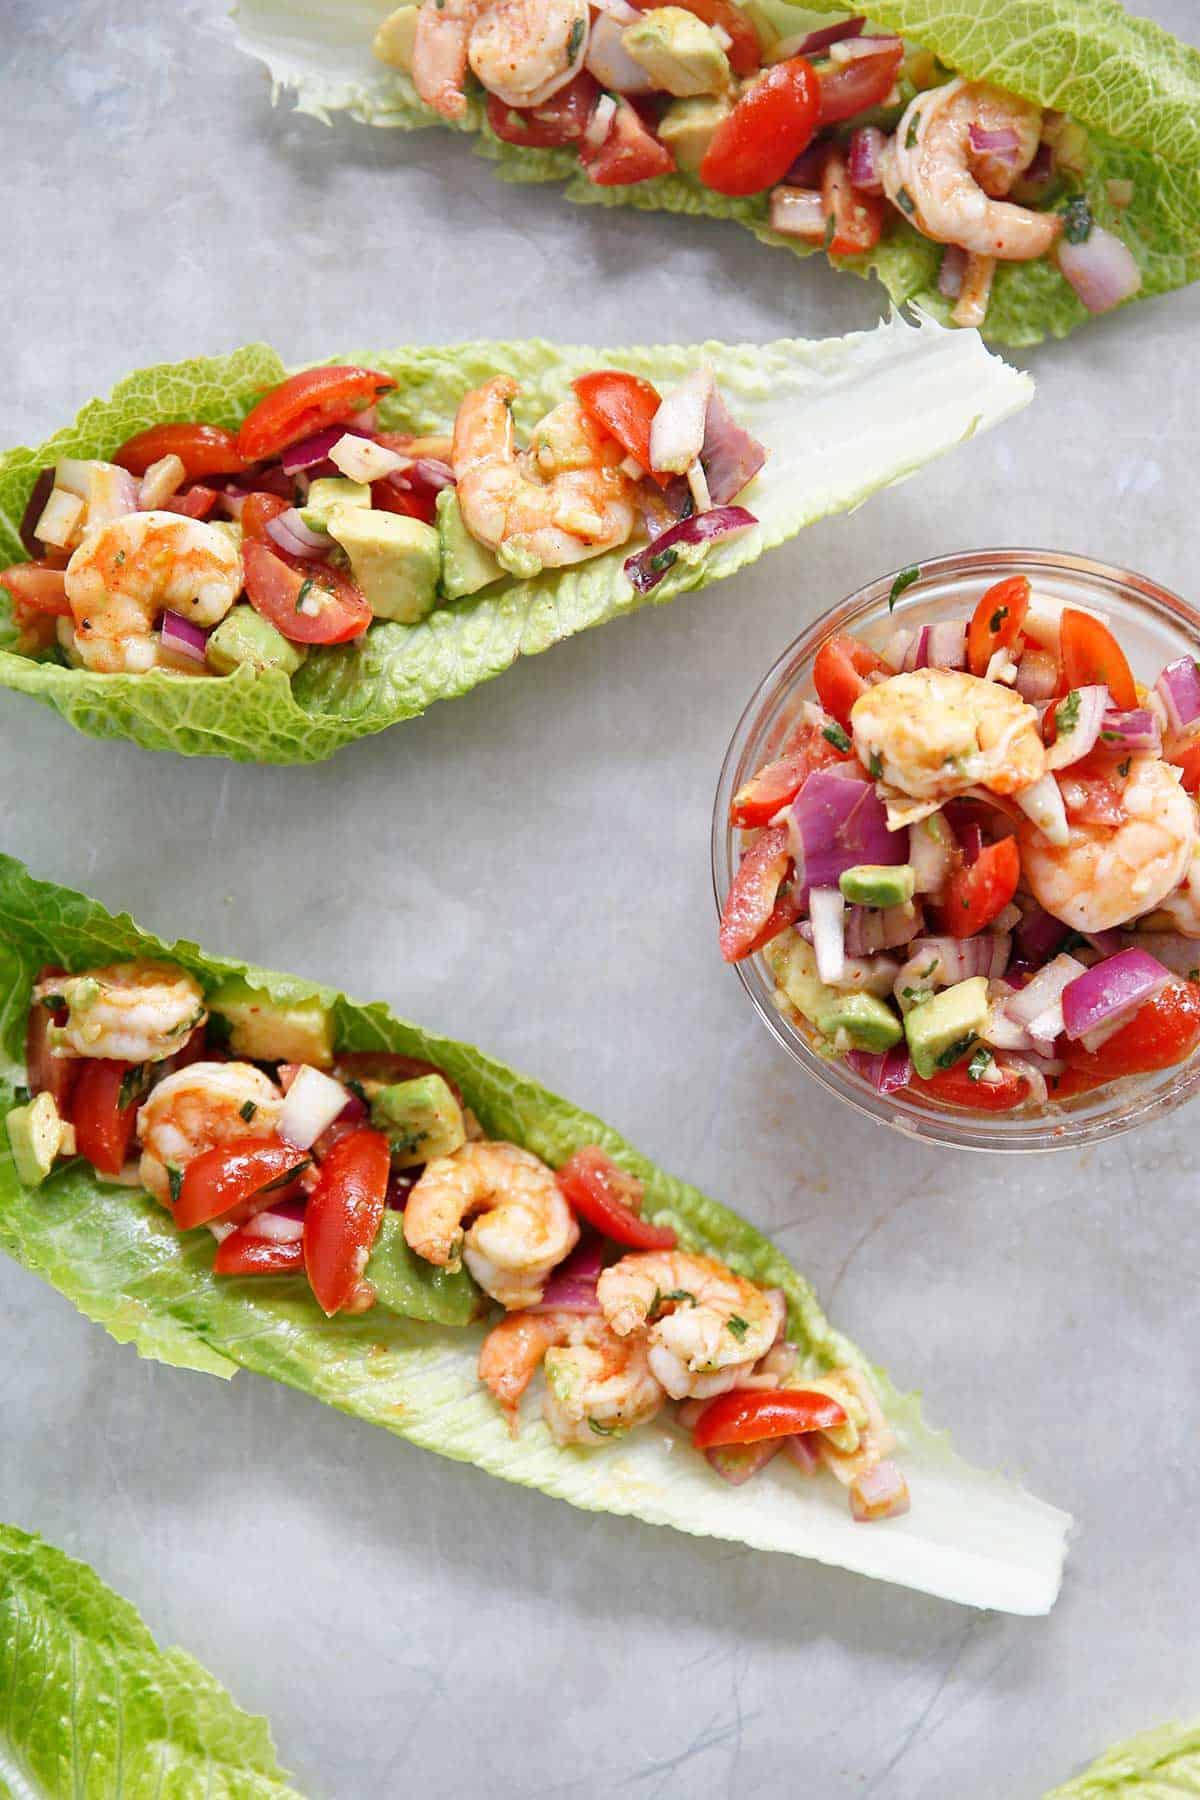 Lemon dressing for shrimp salad in lettuce boats